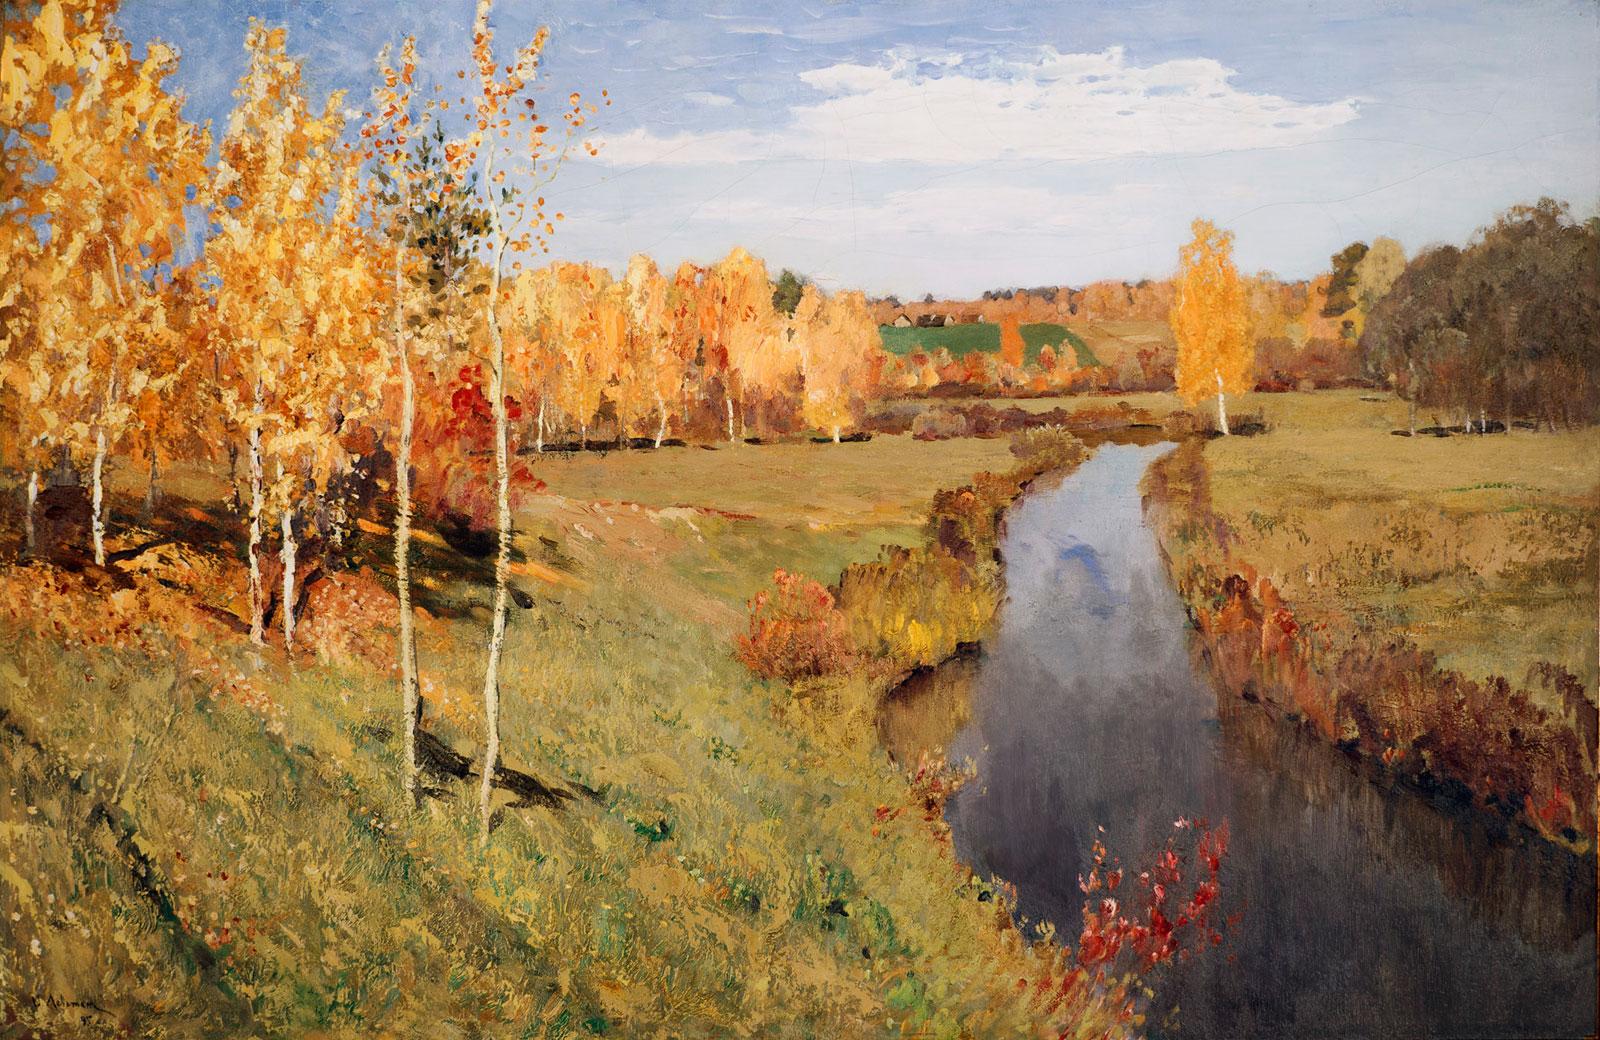 Золотая осень на байкале фото